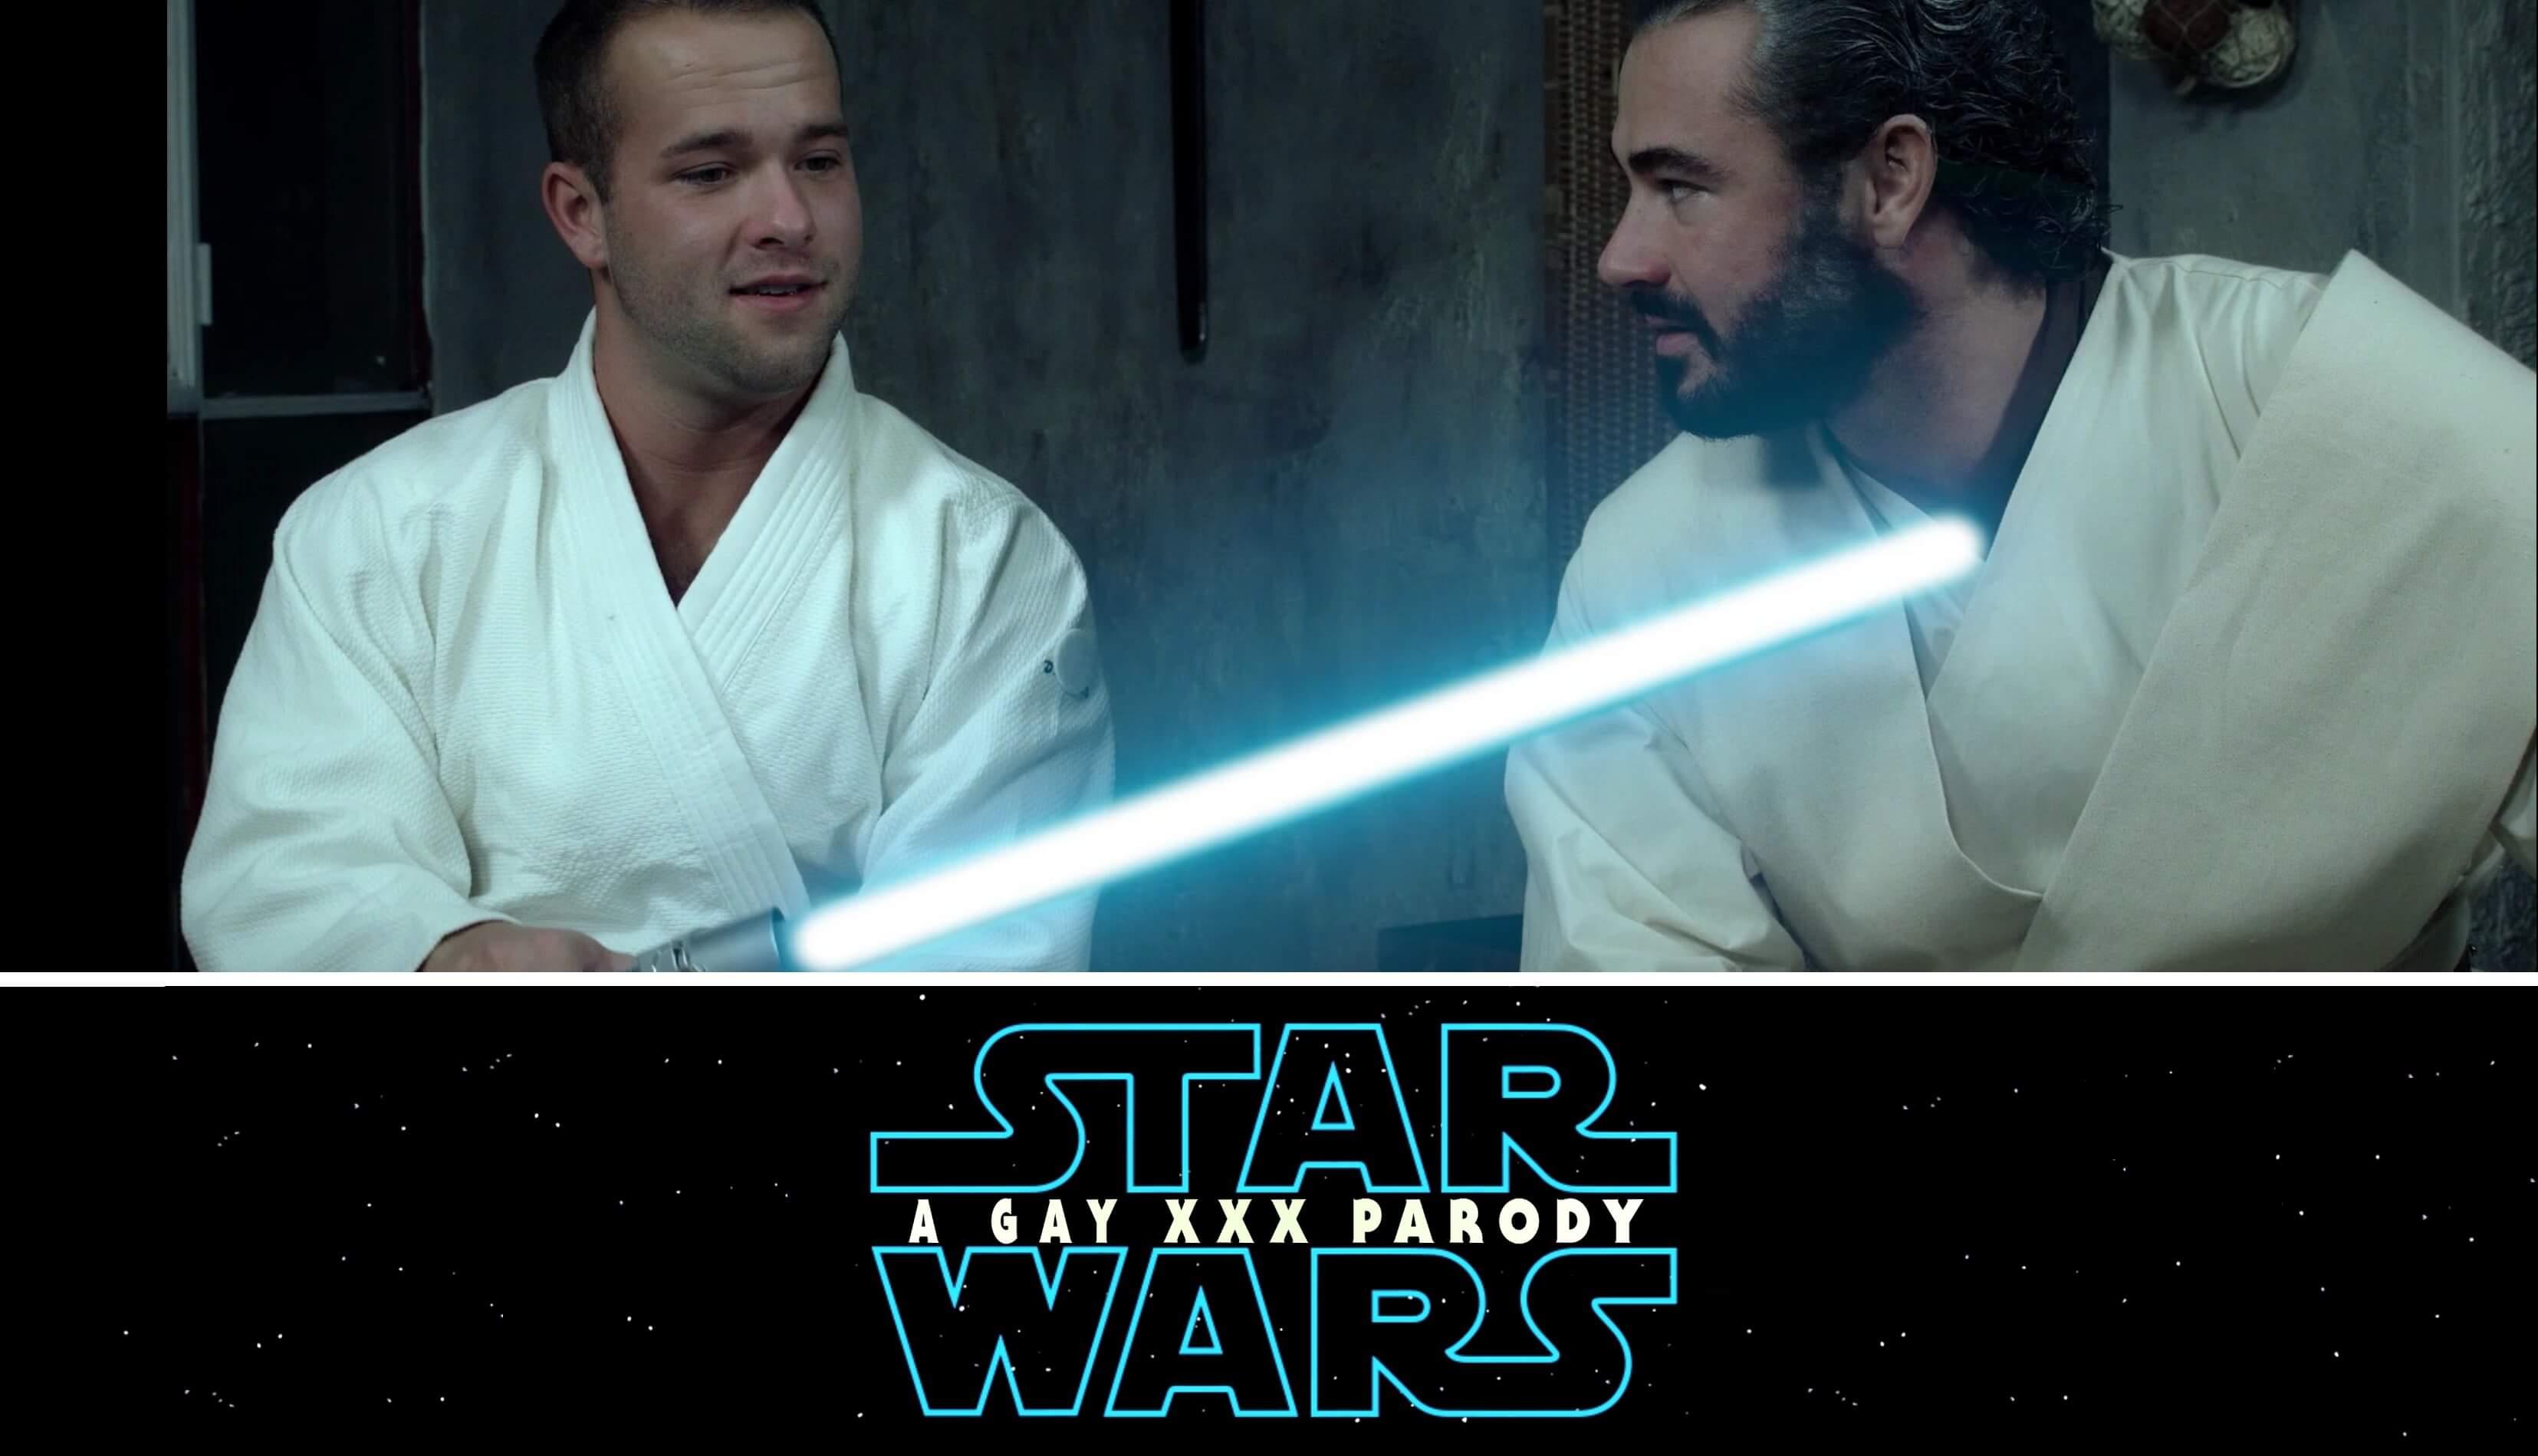 star_wars_versione_gay_porno_di_star_wars